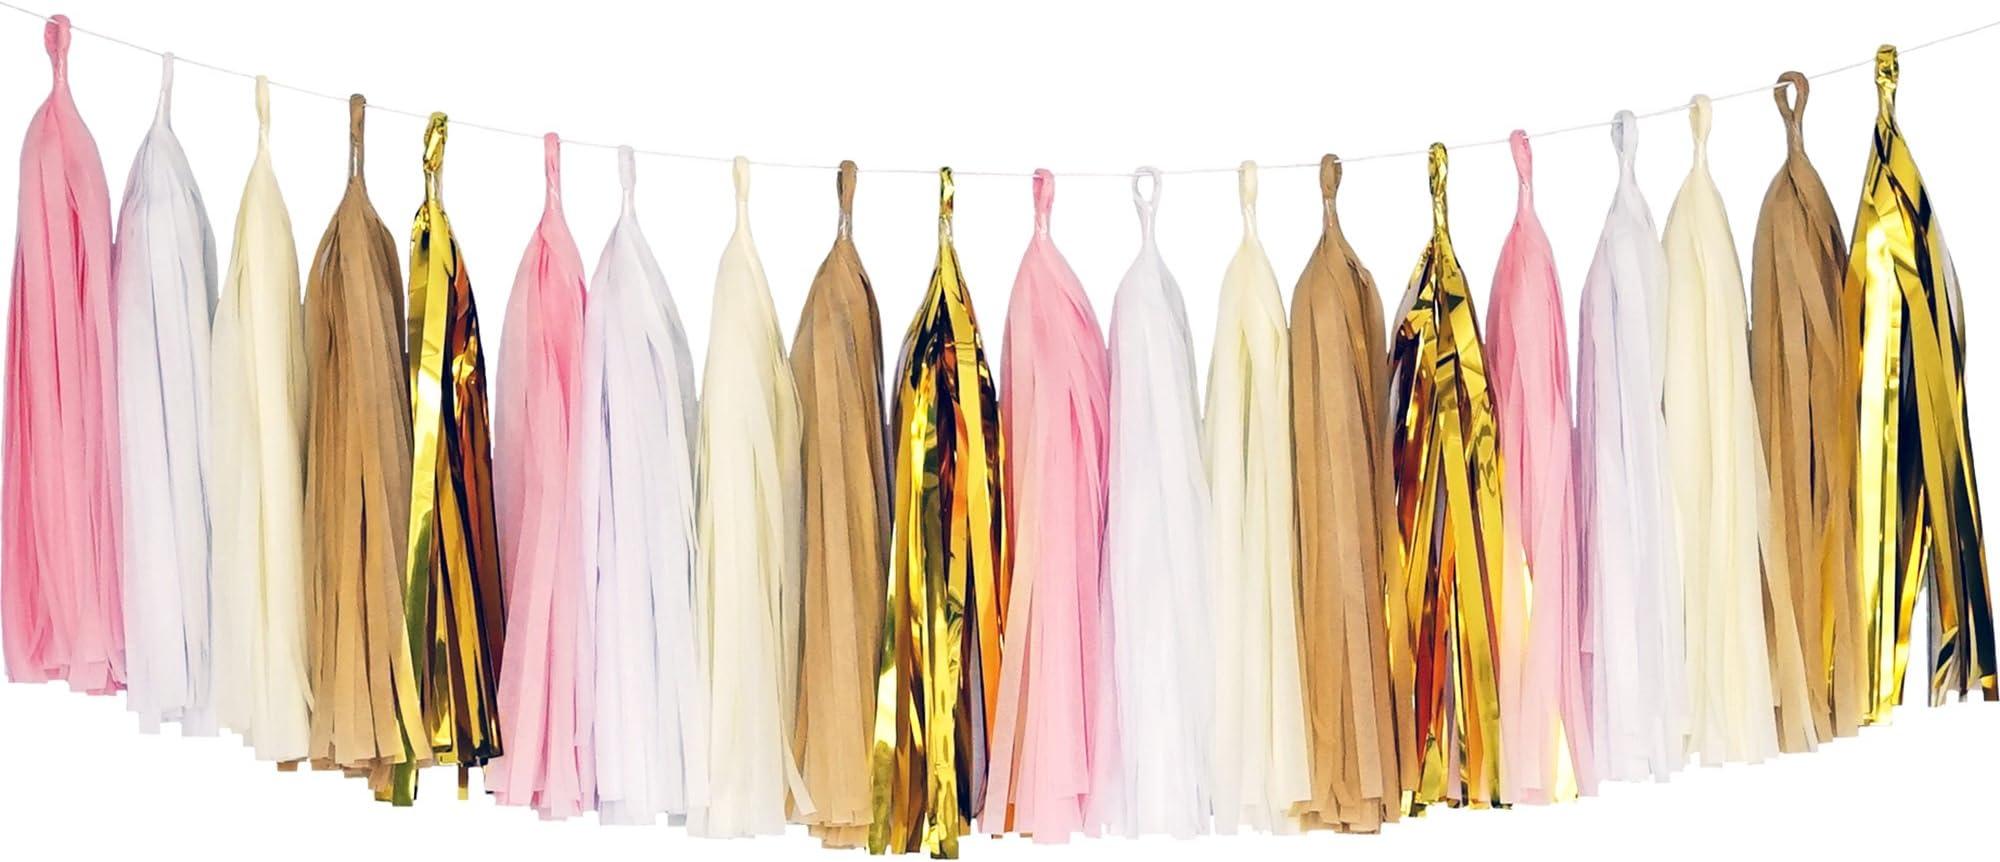 Tissue Paper Tassel Garlands 5 Carnation Pink Tassel Garlands DIY KIT Birthday Baby Shower Wedding Party Same Day Shipping